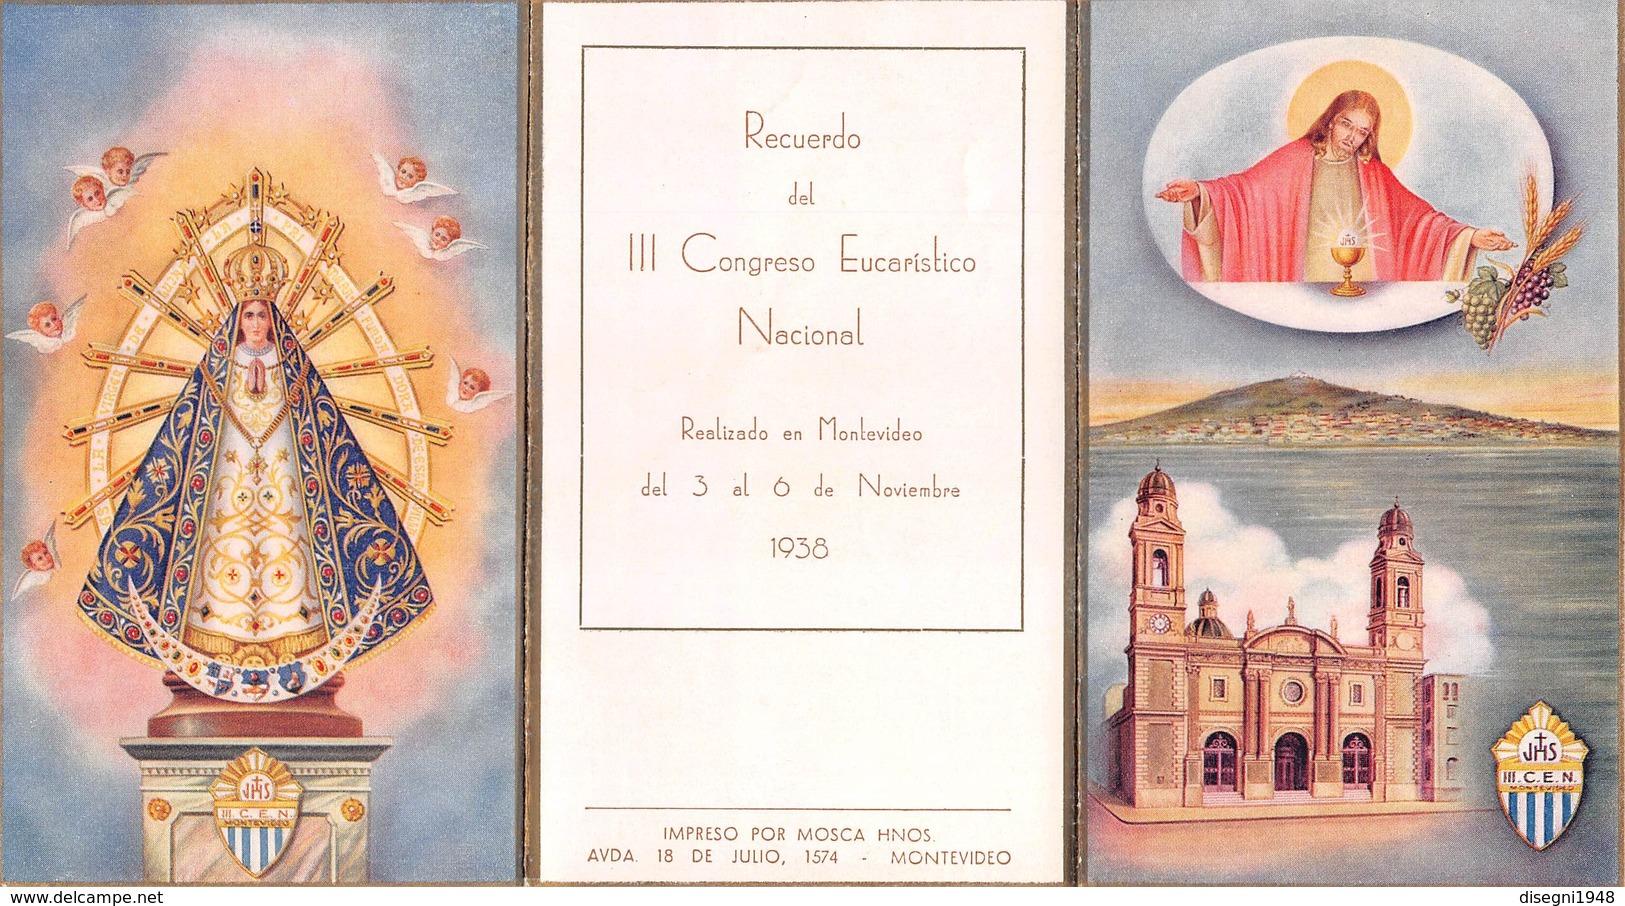 "07460 ""RECUERDO DEL III CONGRESO EUCAURISTICO NACIONAL  - MONTEVIDEO - URUGUAY - NOVEMBRE 1938"" IMM. RELIG. ORIG. - Santini"